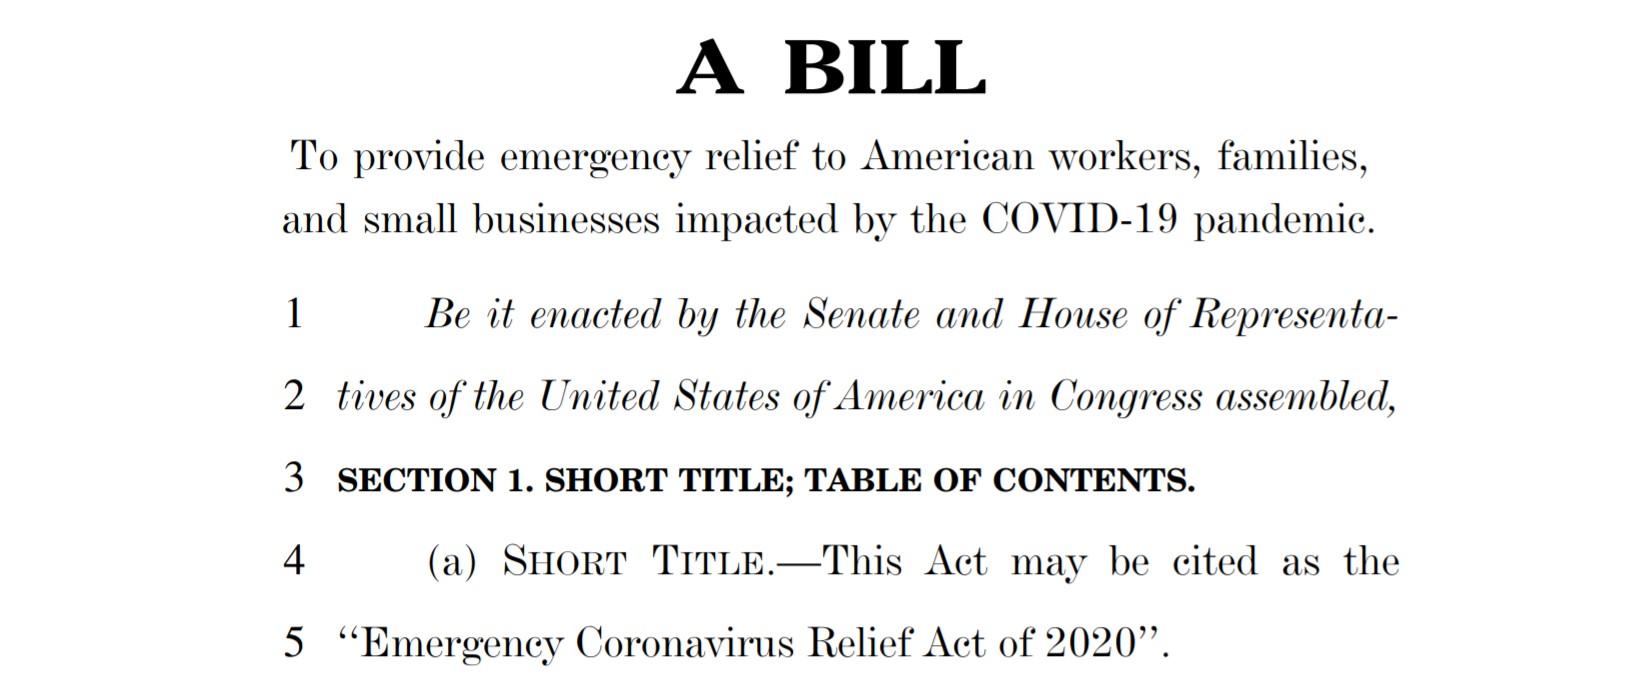 Emergency Coronavirus Relief Act of 2020